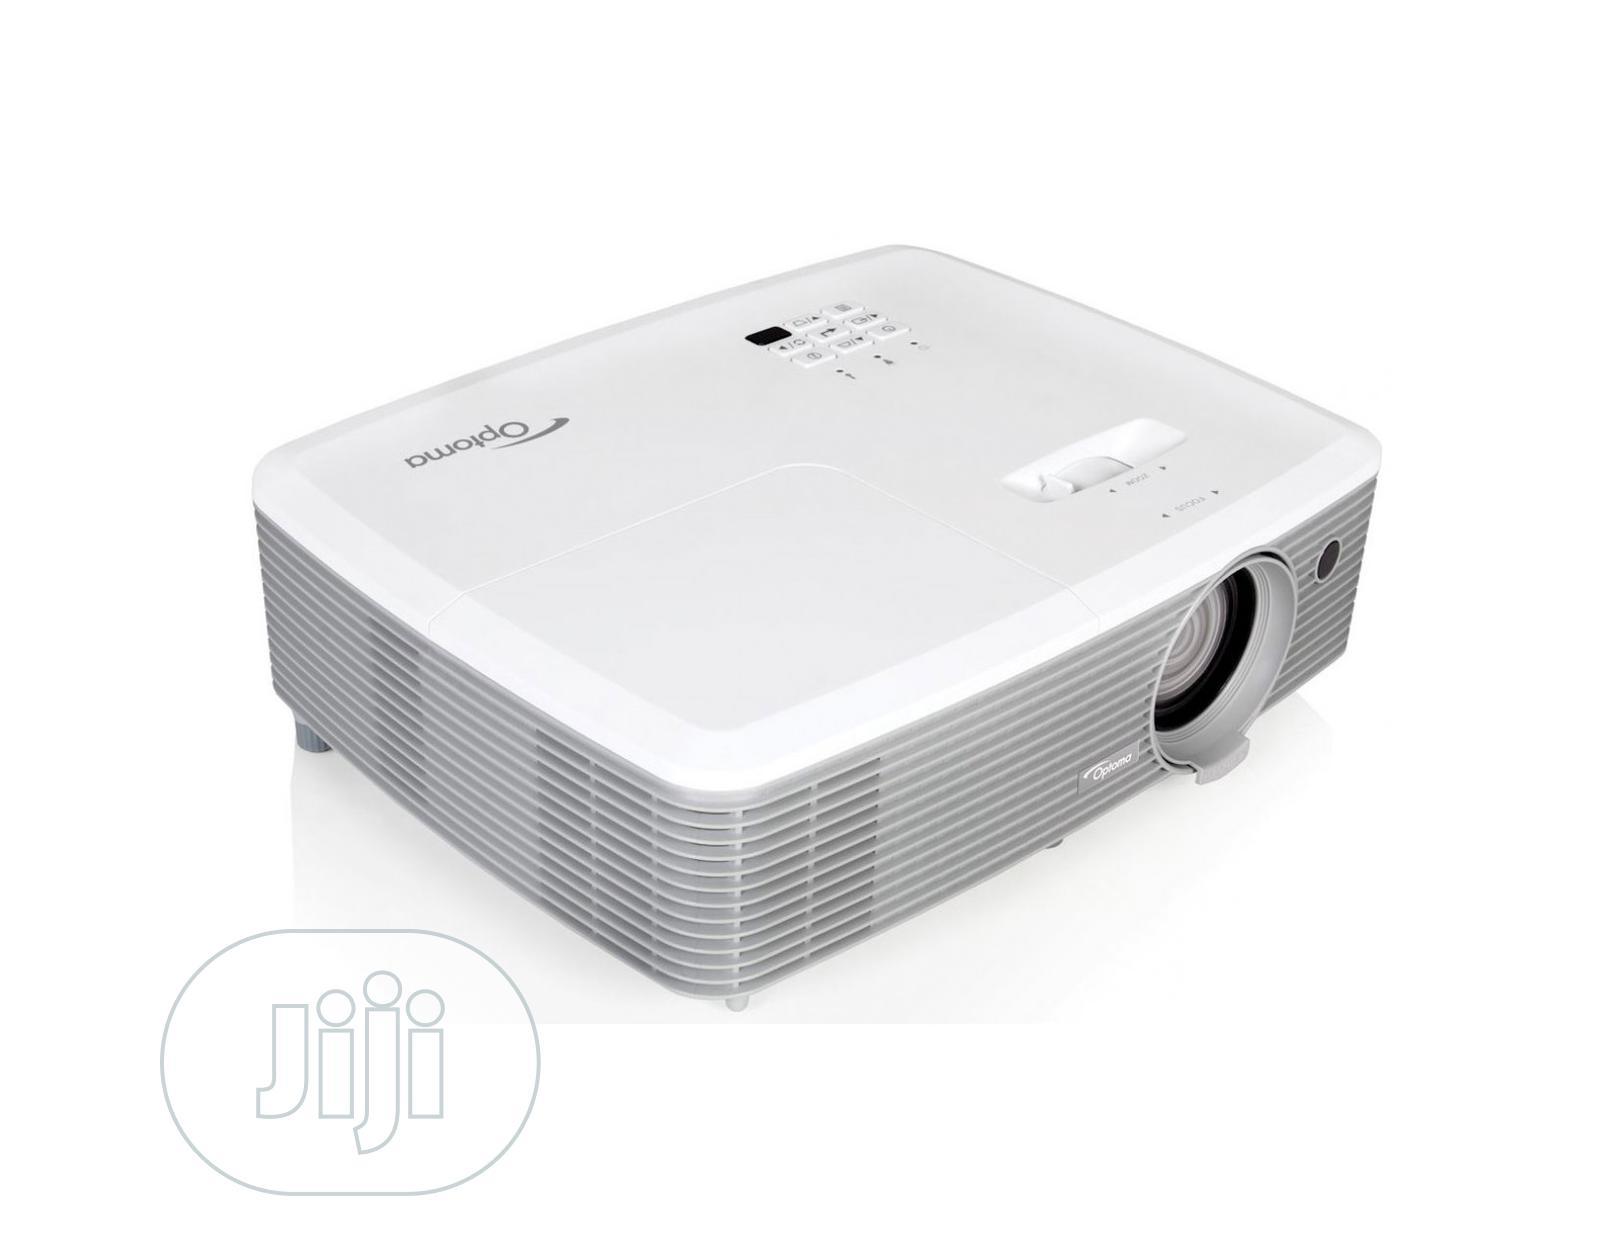 Optoma UHD30 True 4K UHD Gaming Projector